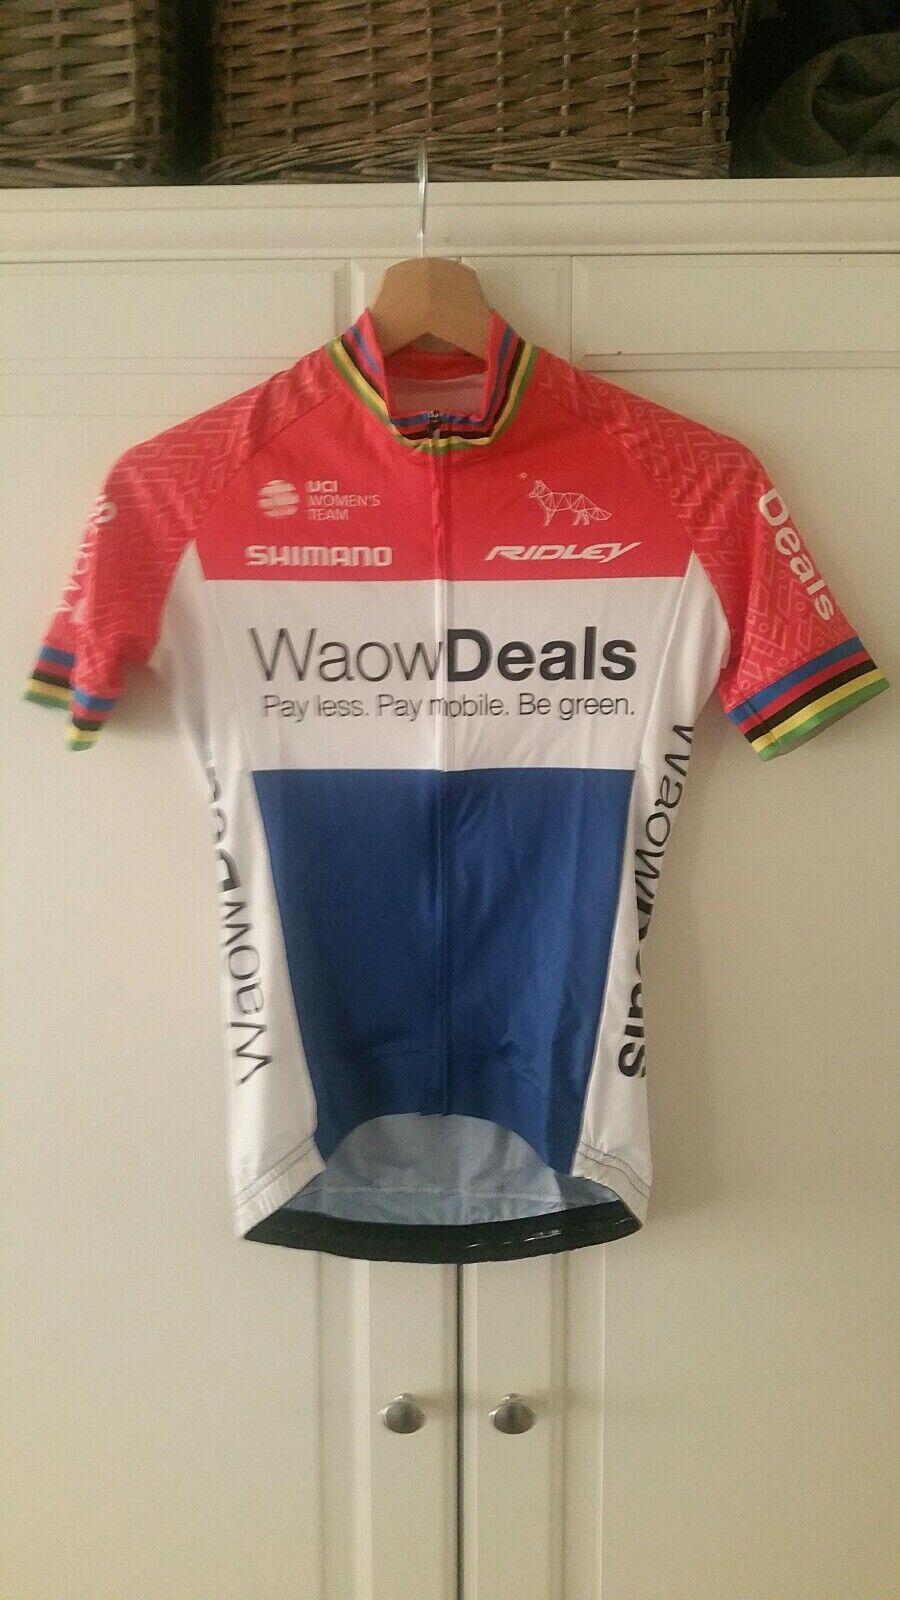 Zeitfahranzug Waowdeals MARIANNE VOS radtrikot skinsuit cycling xxs Champion